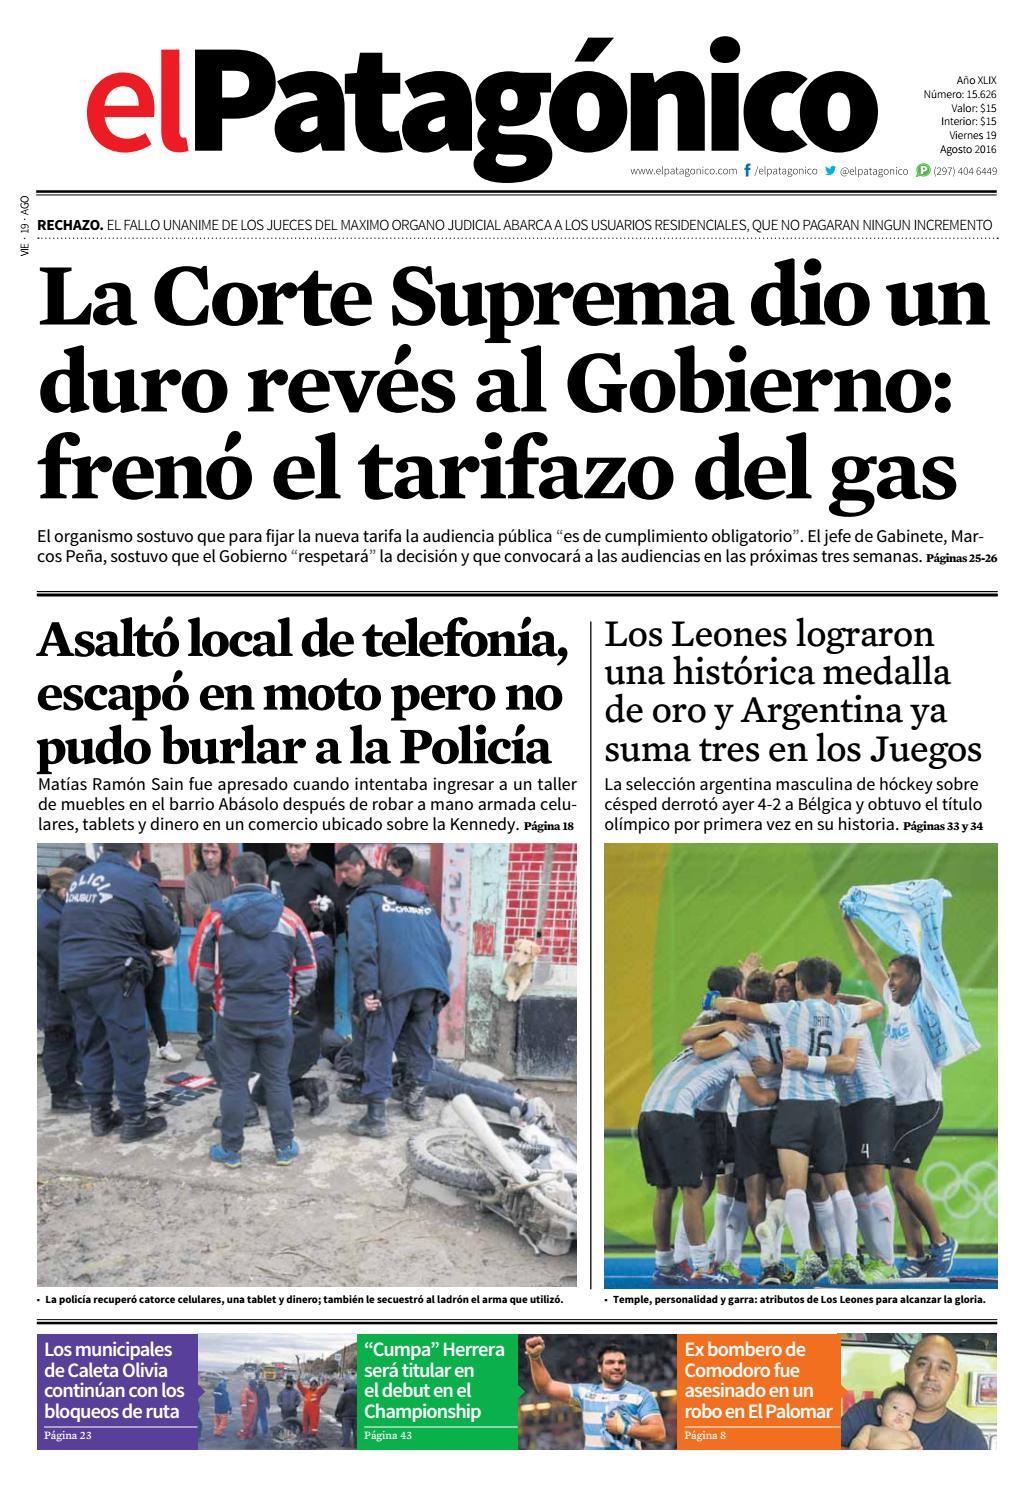 edicion231218082016.pdf by El Patagonico - issuu